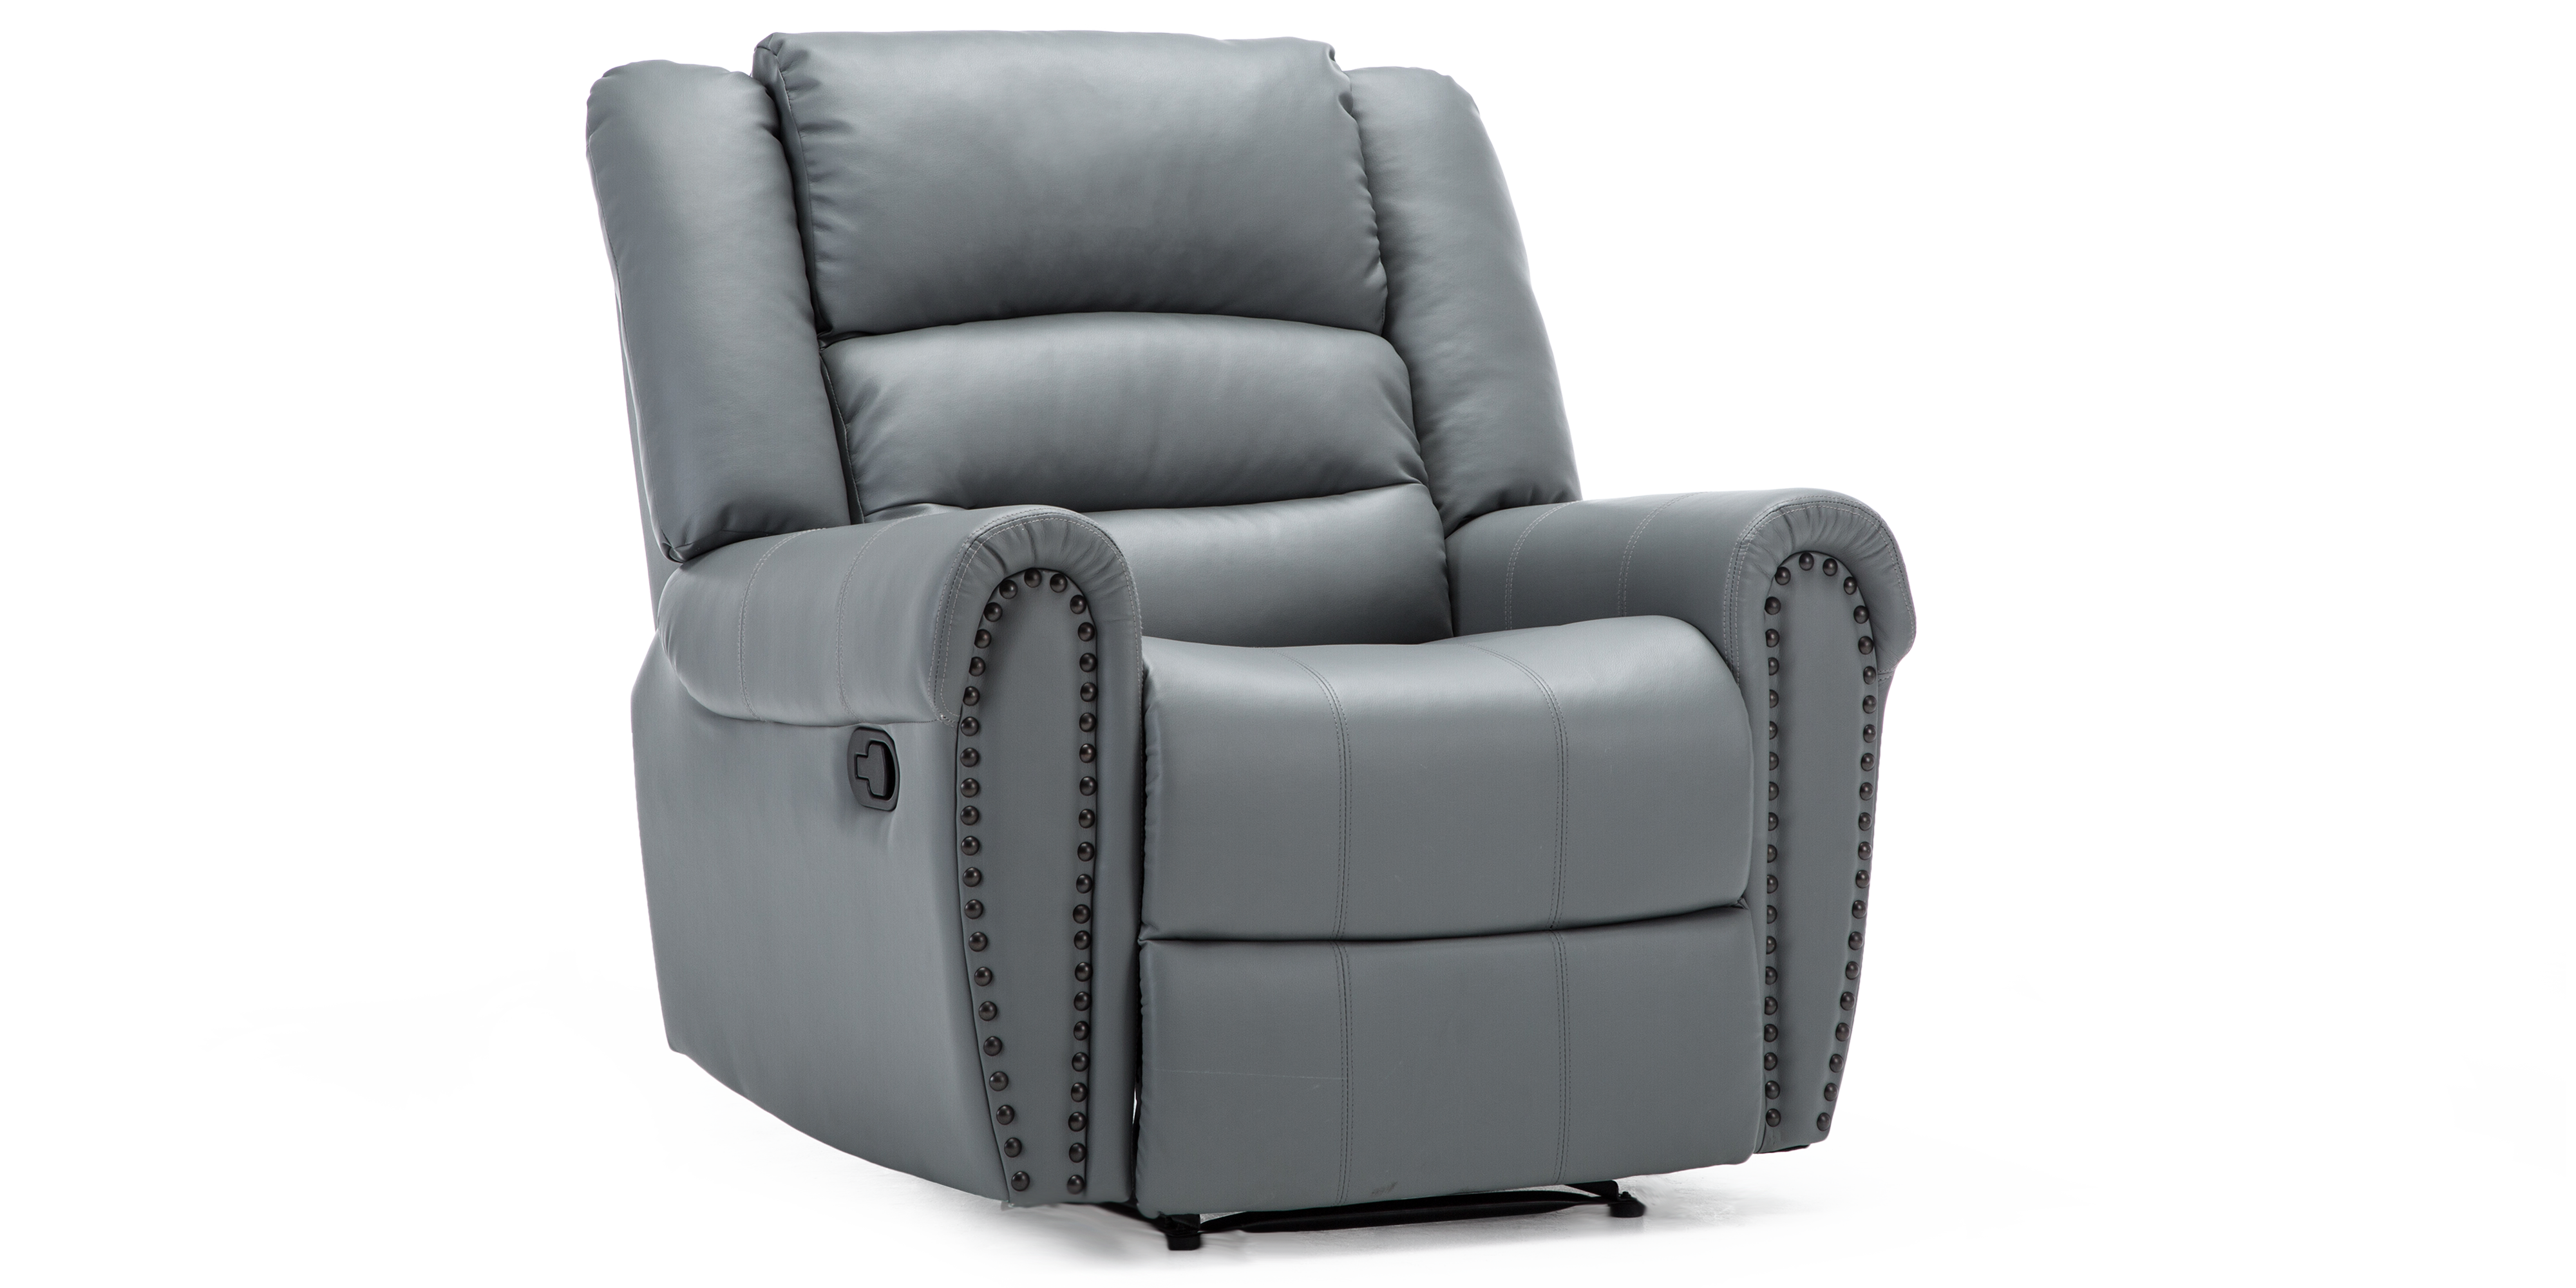 Denbury Manual Recliner Chair In Grey